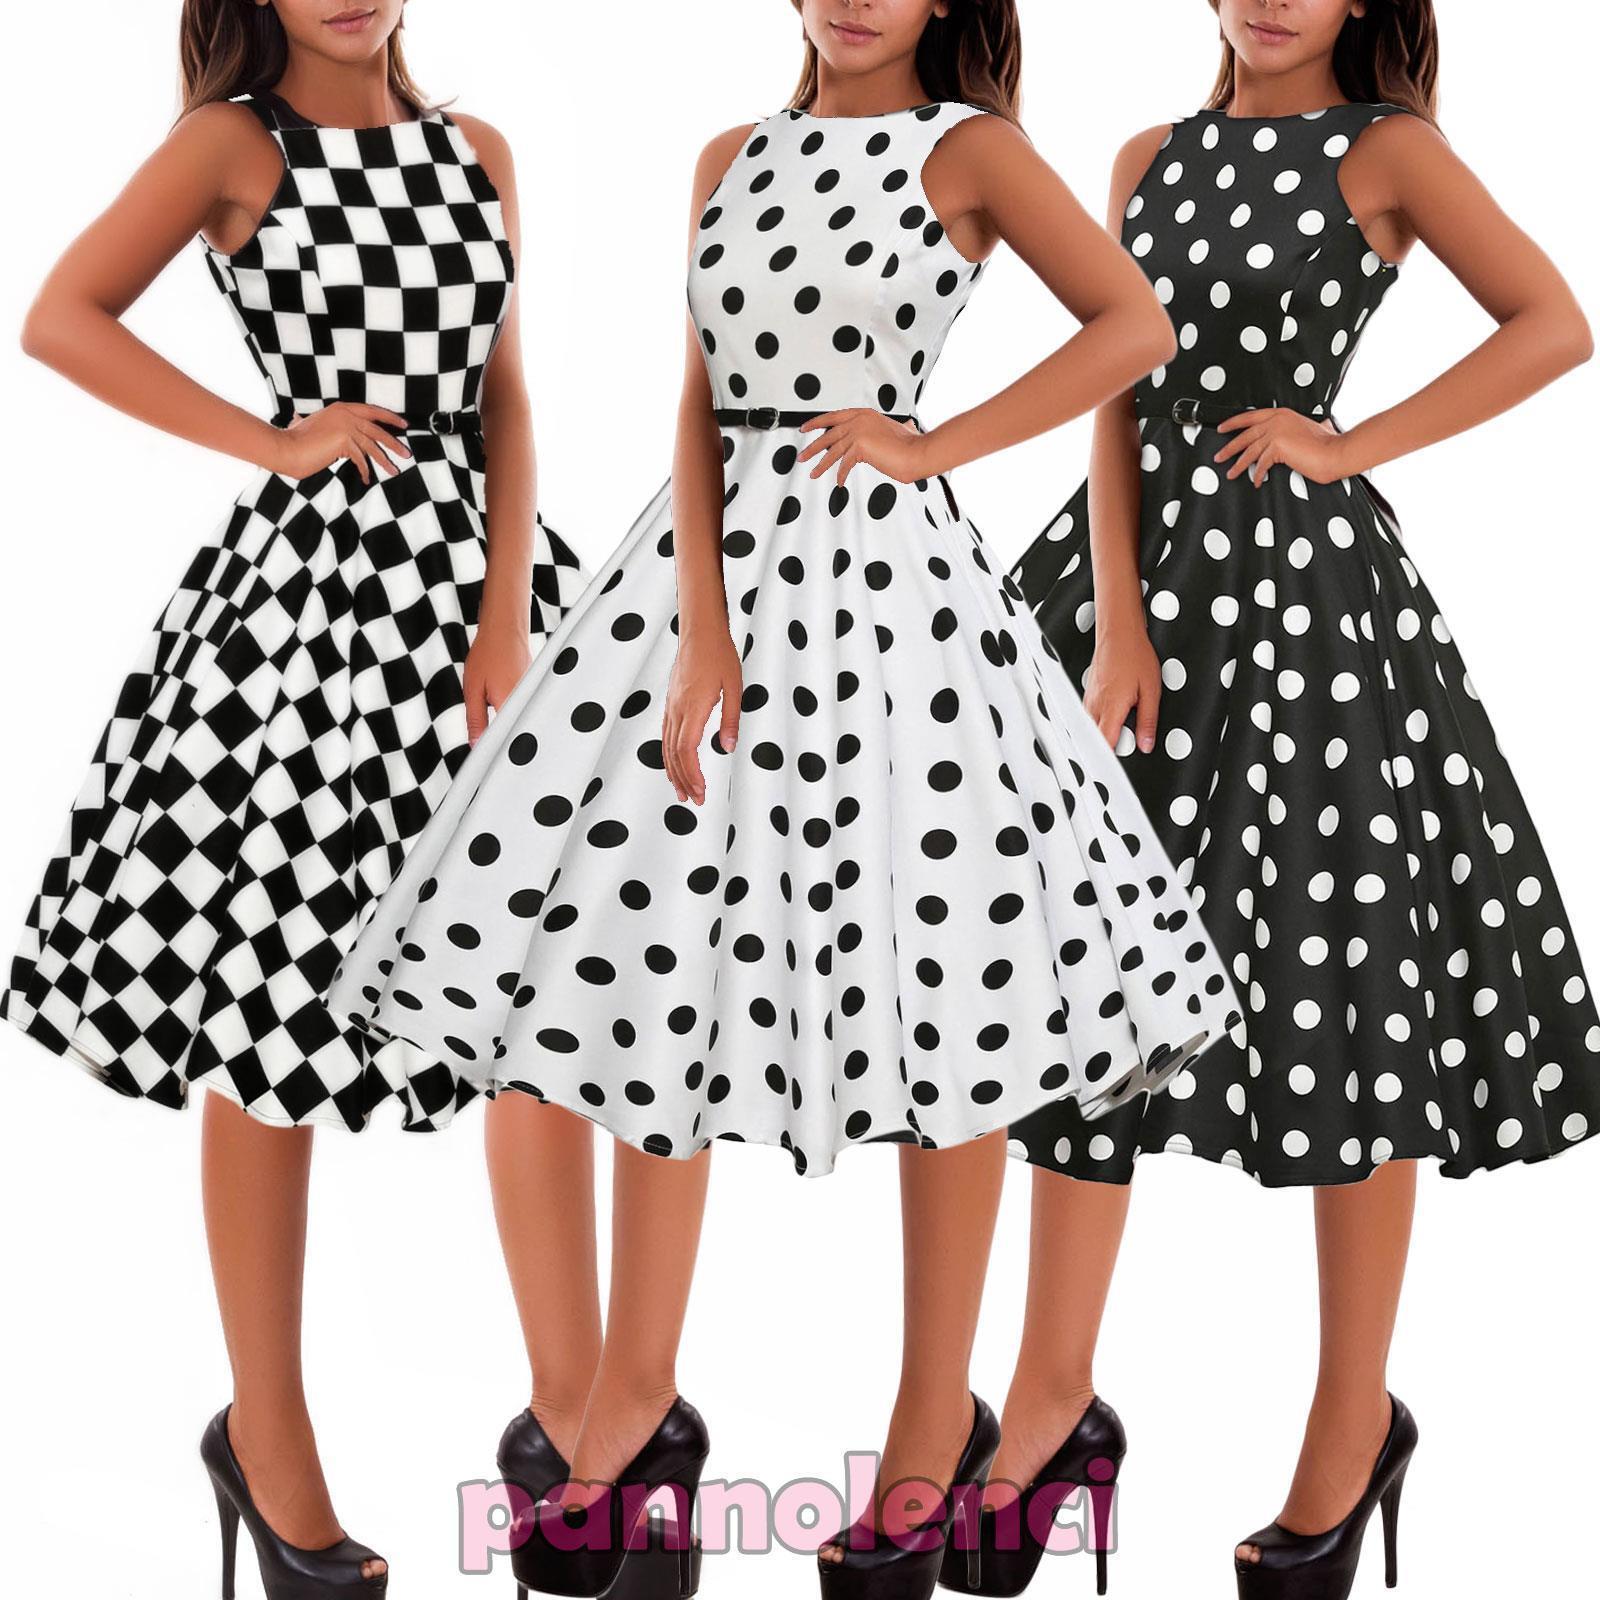 50s Blu a Pois Giorno Costume Donna Vintage Fantasia Abito Outfit 2760